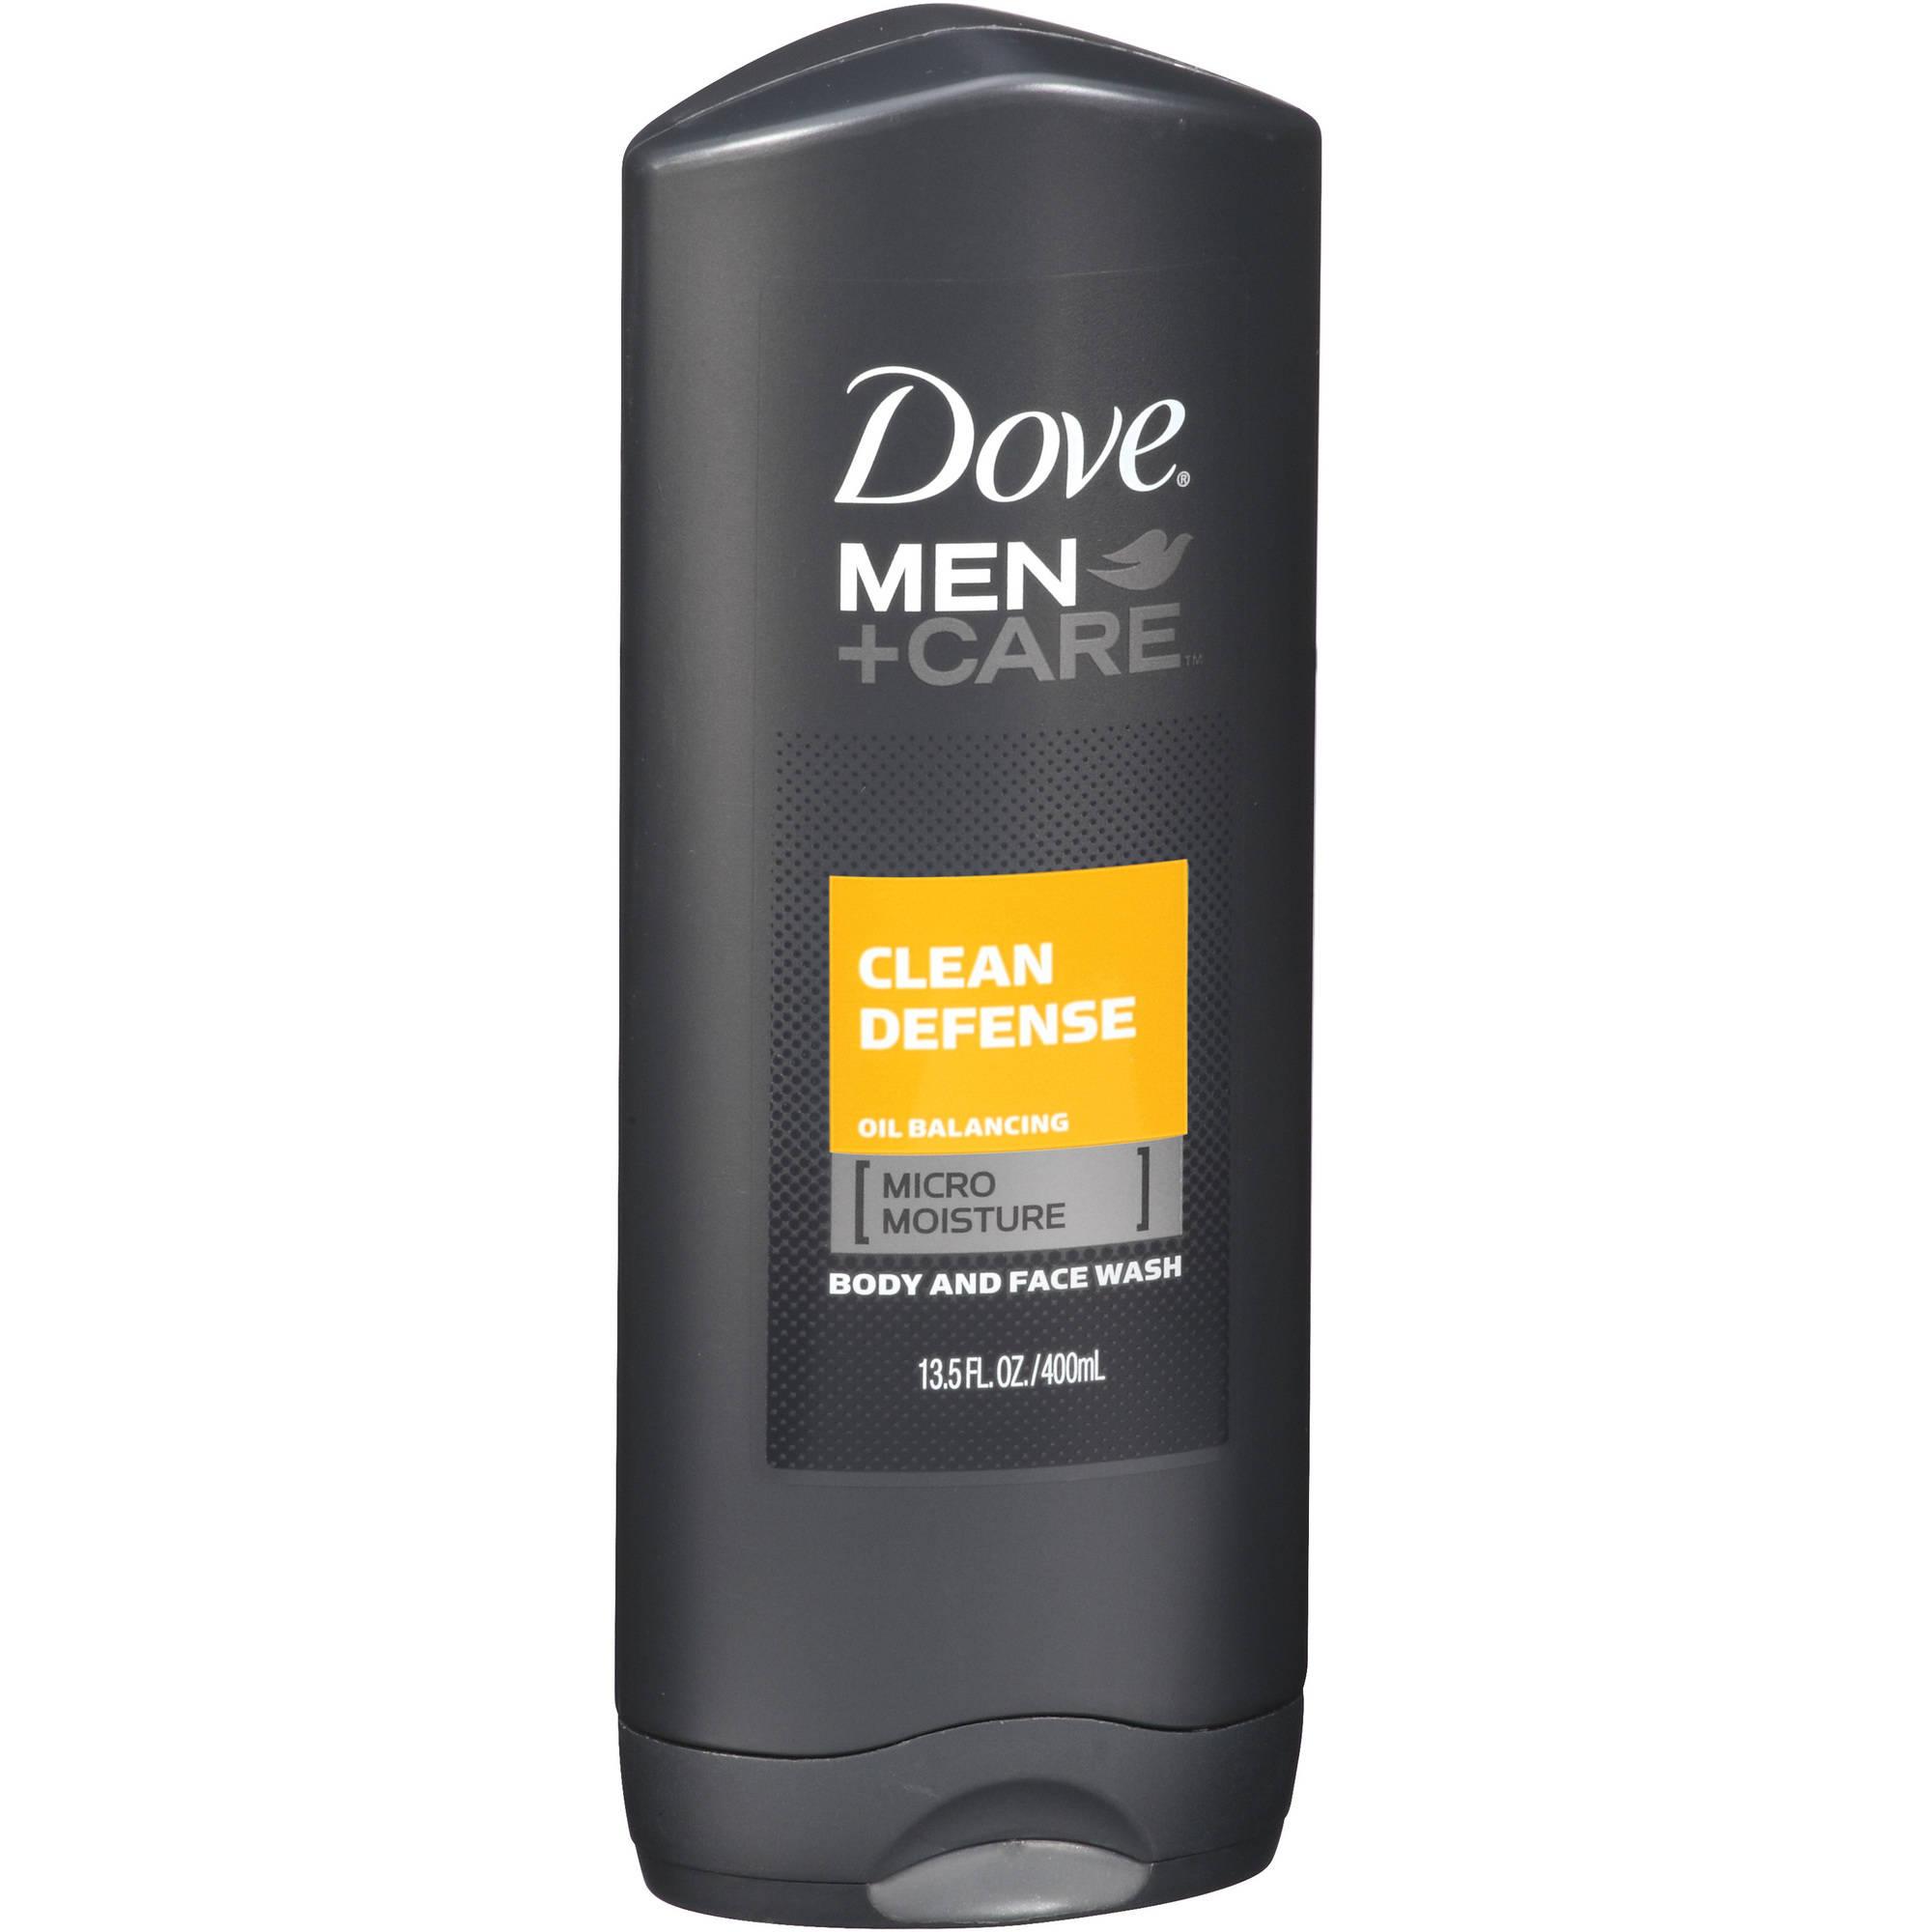 Men+ Care Clean Defense Body and Face Wash Dove 13.5 oz Body Wash Men